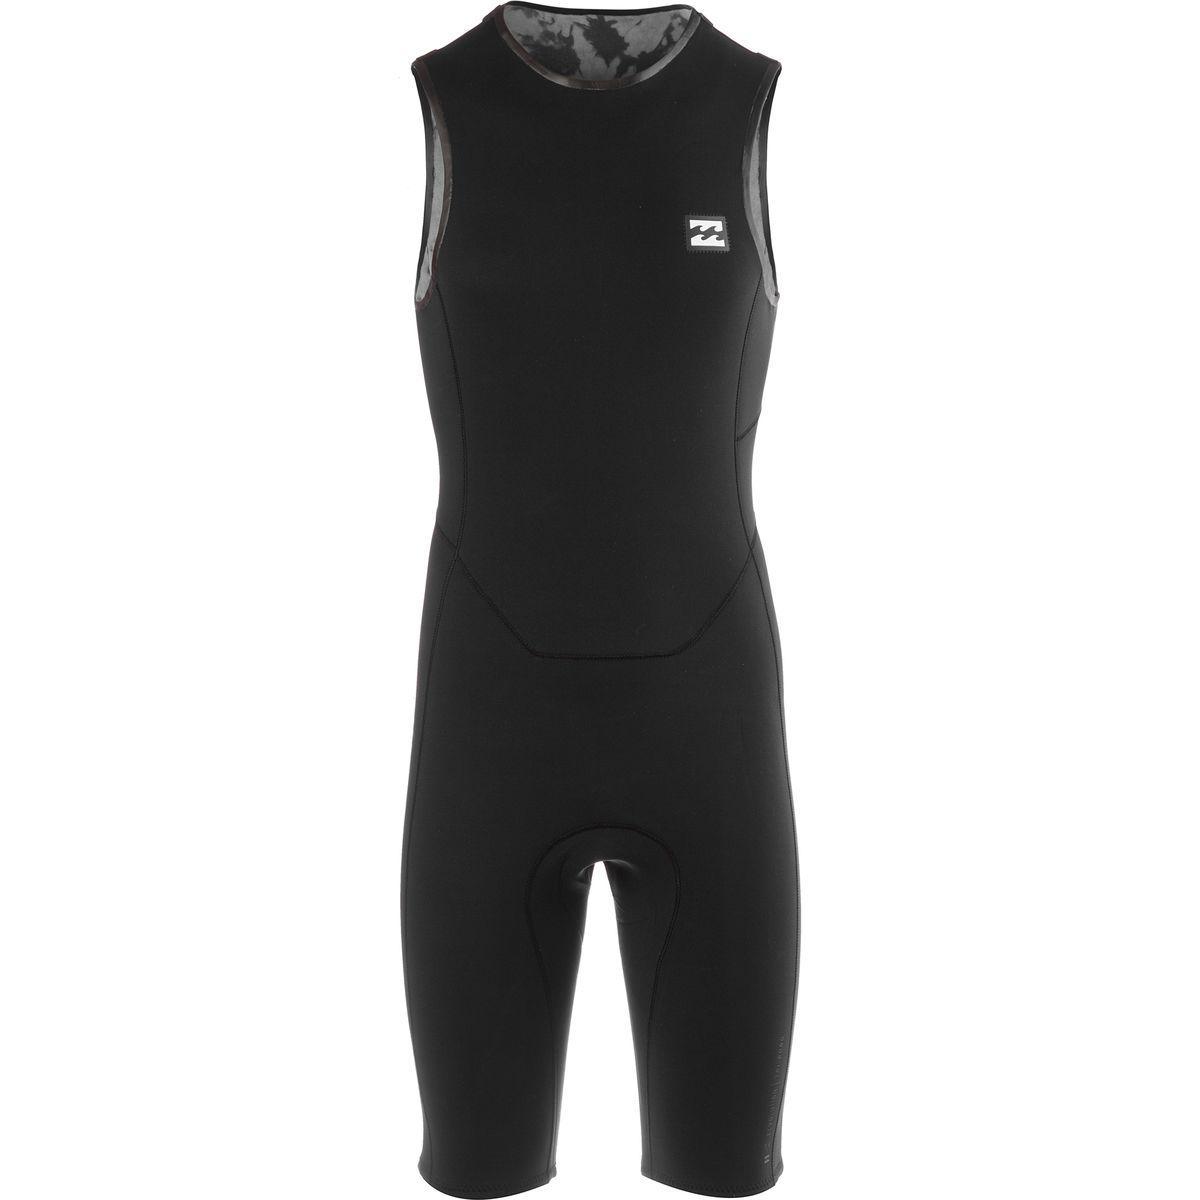 Lyst - Billabong 202 Revolution Reversible Wetsuit in Black for Men 461579ef7